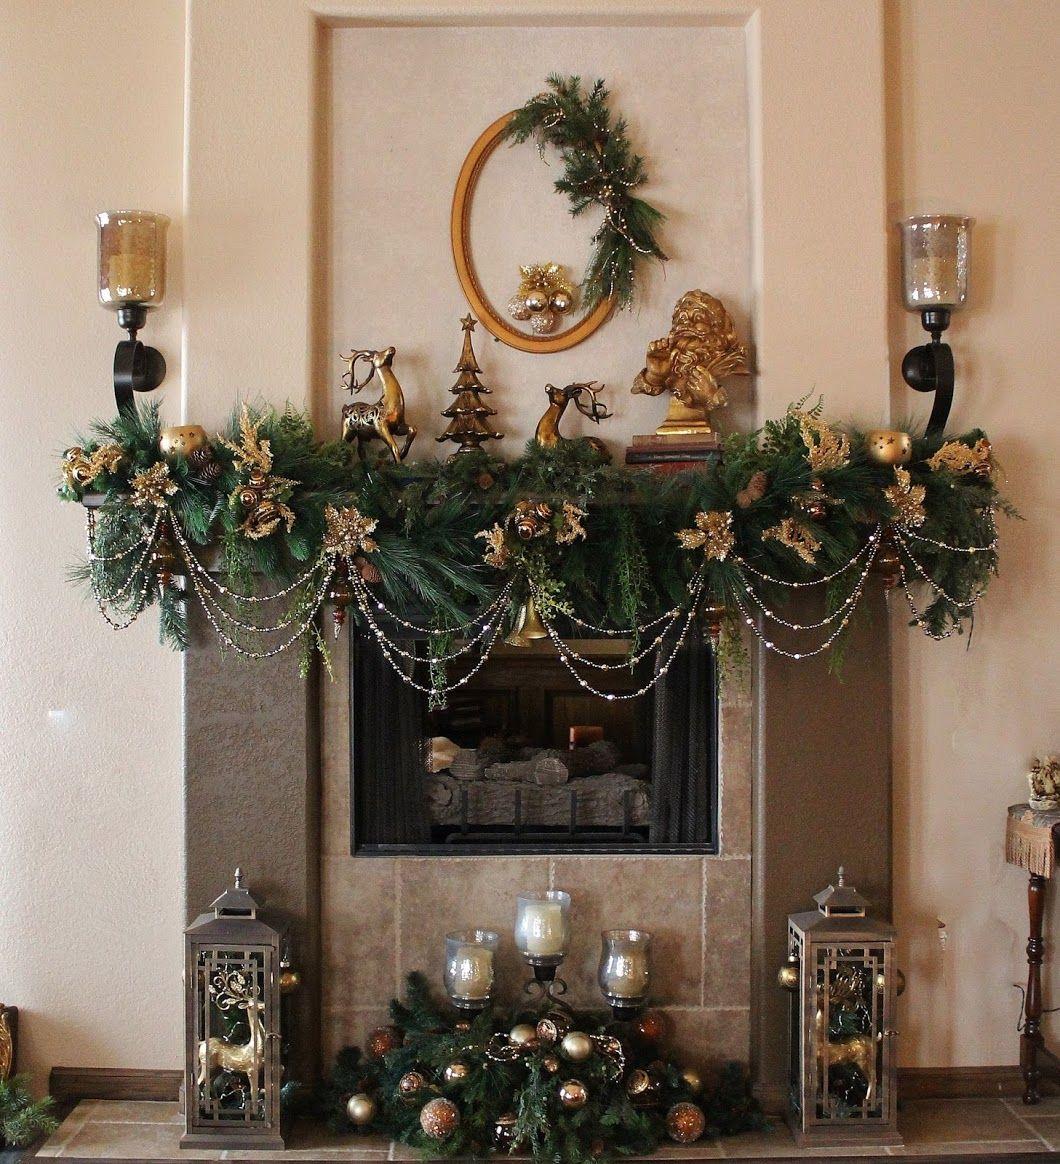 Elegant Christmas mantel | Frazadas | Pinterest | Elegant ...